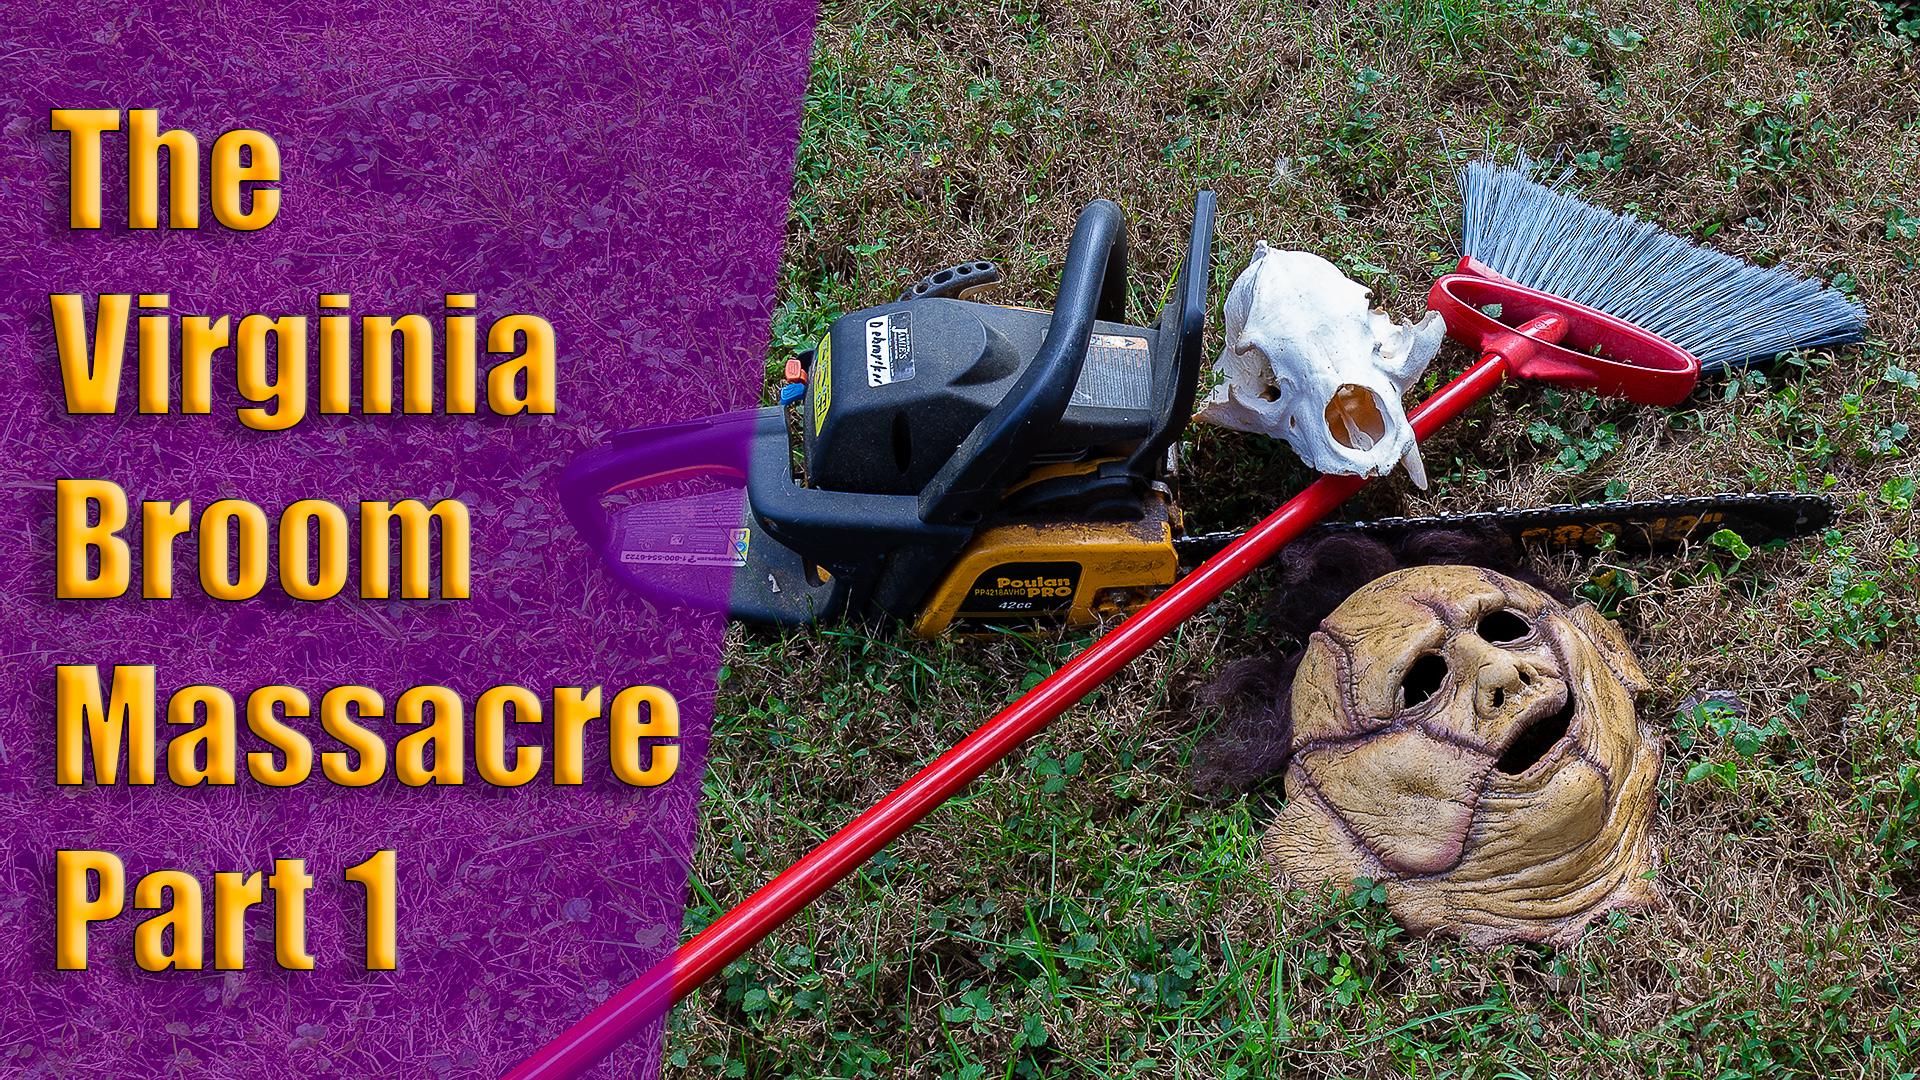 The Virginia Broom Massacre Part 1